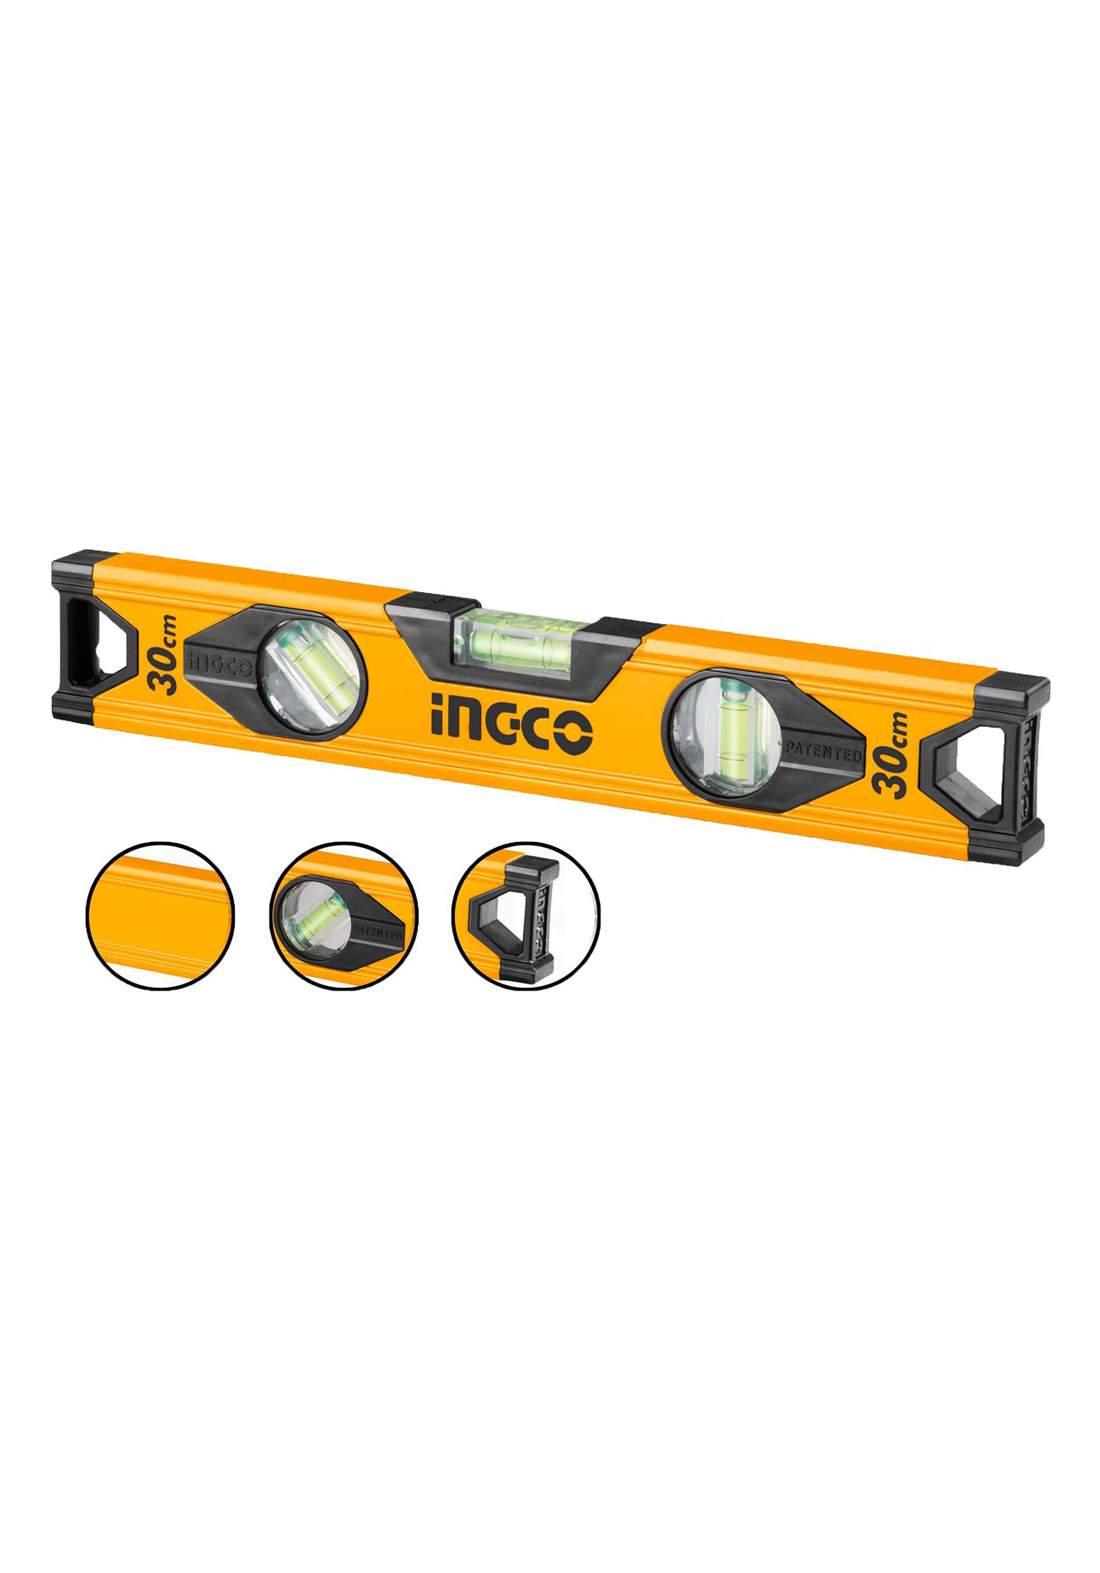 Ingco hsl18030 level كبان 30 سم